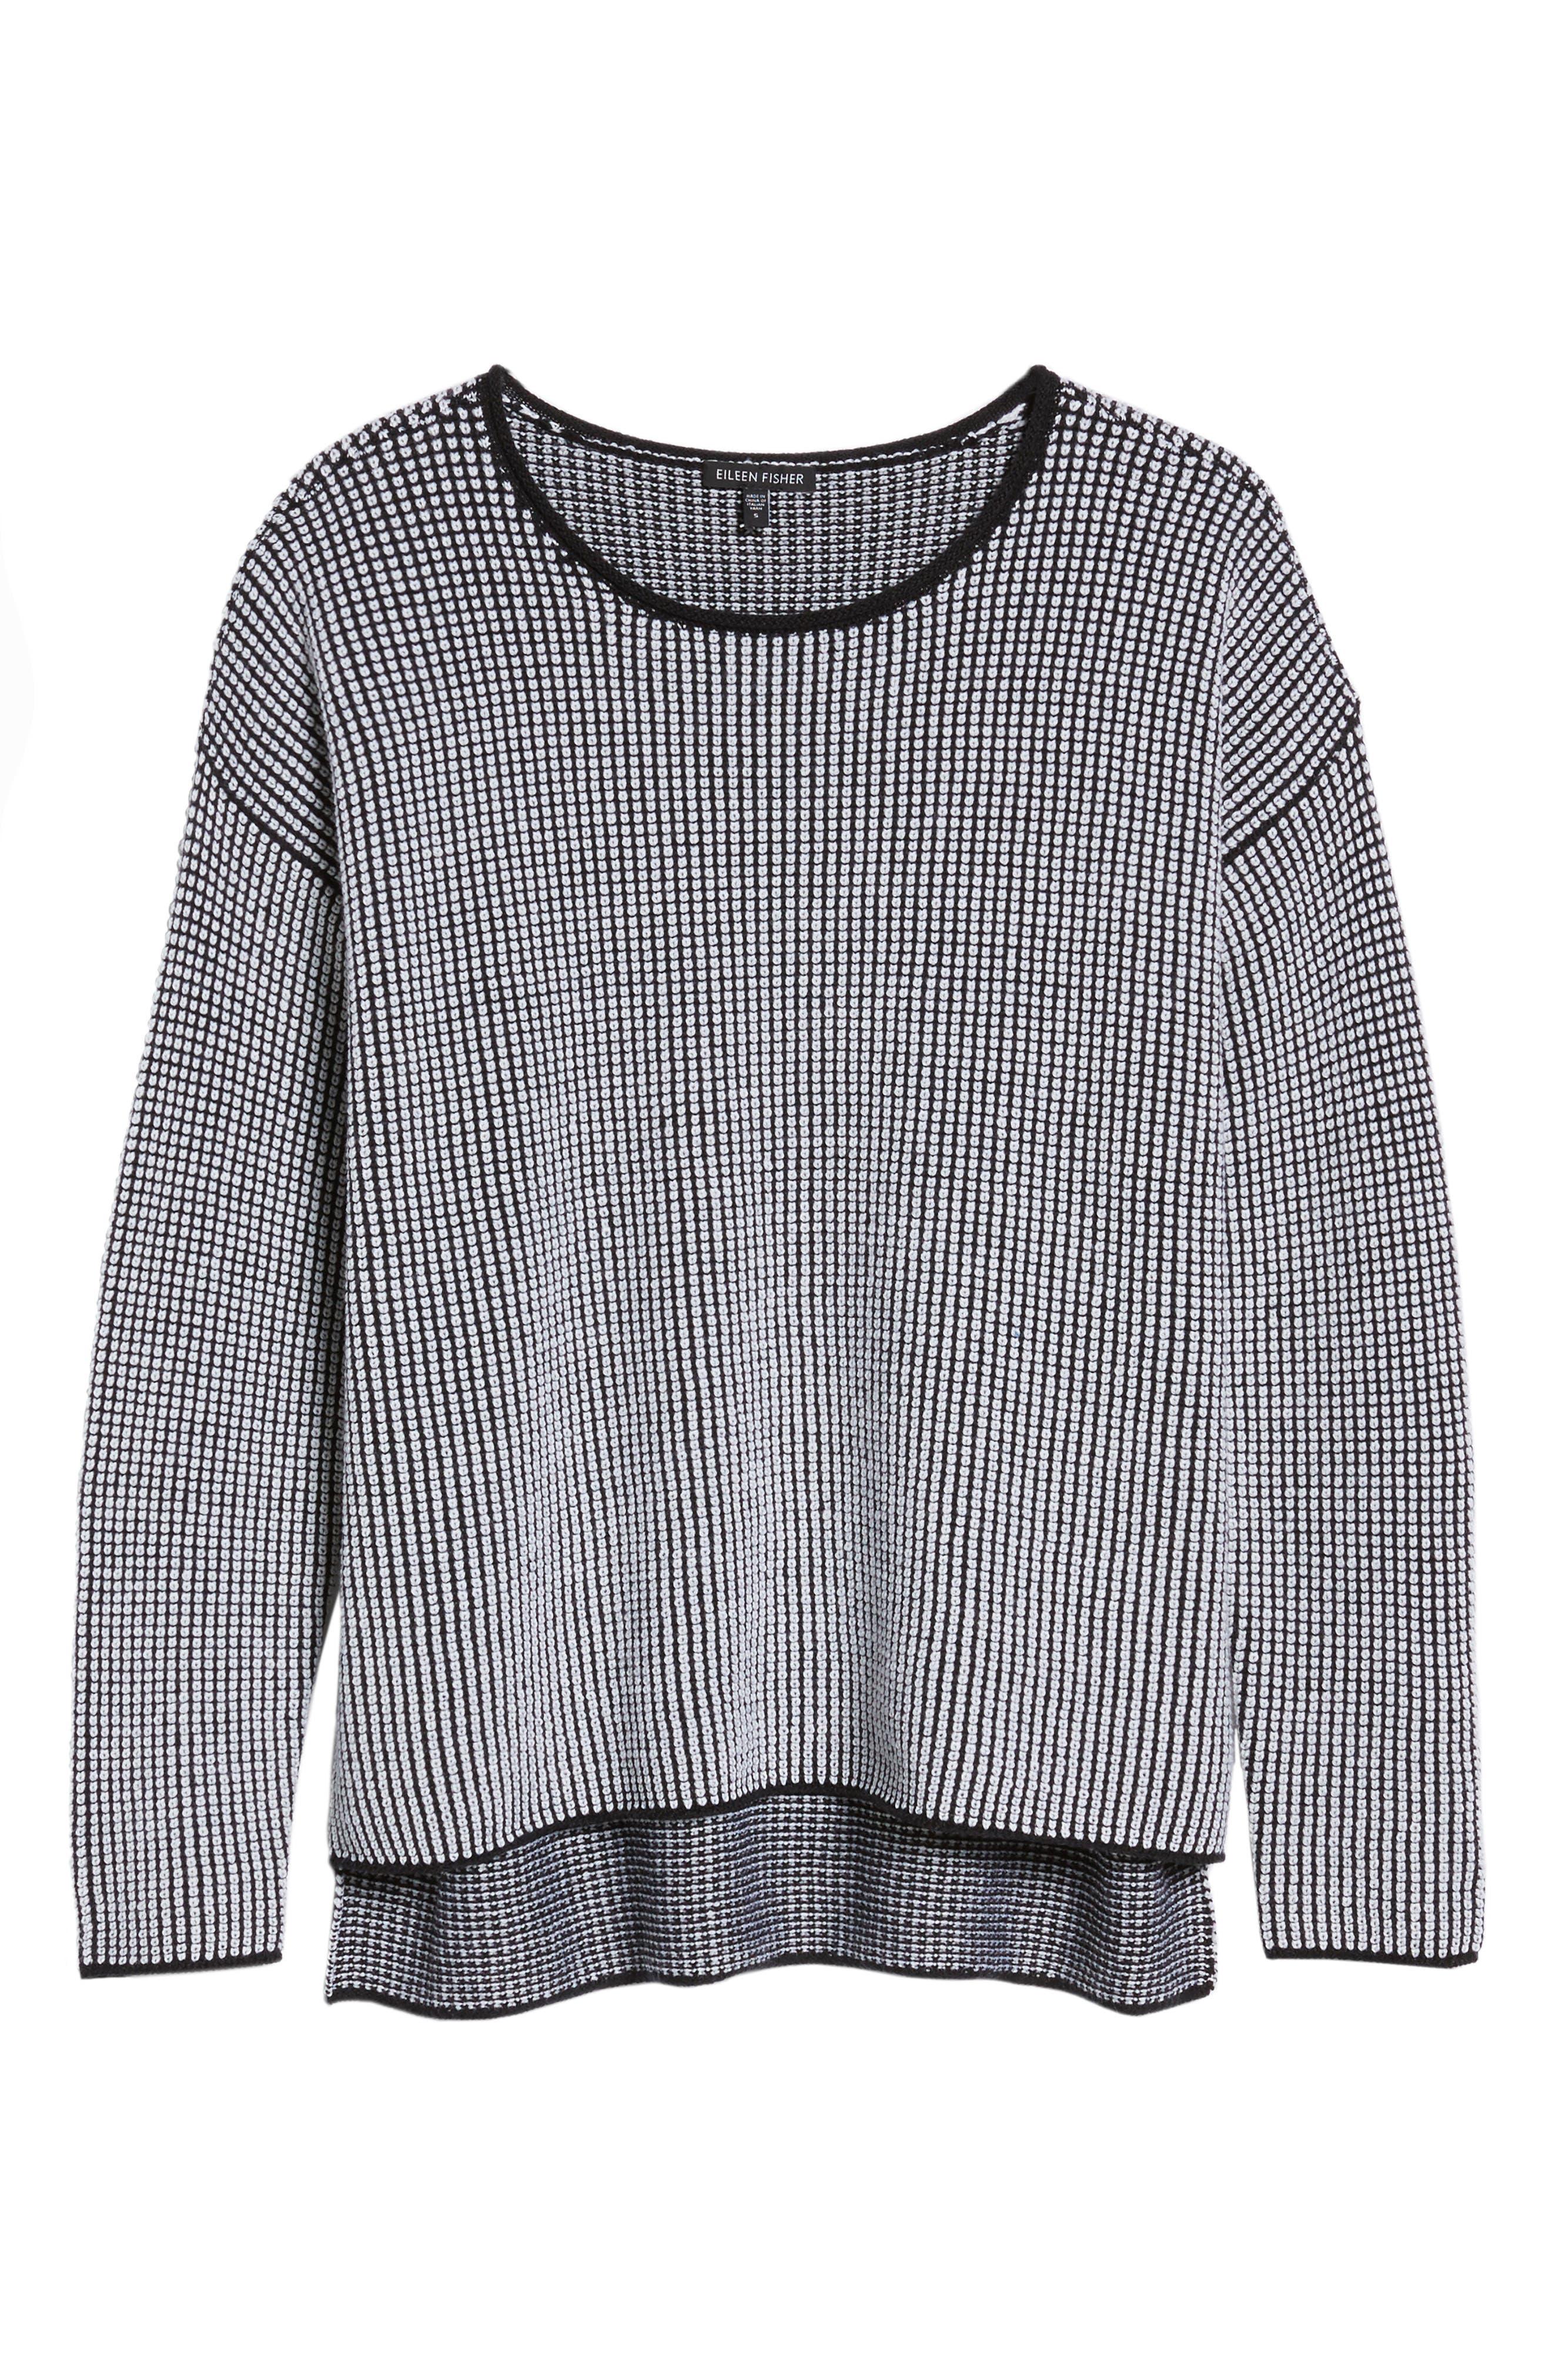 Textured Merino Wool Sweater,                             Alternate thumbnail 7, color,                             Black/ Soft White